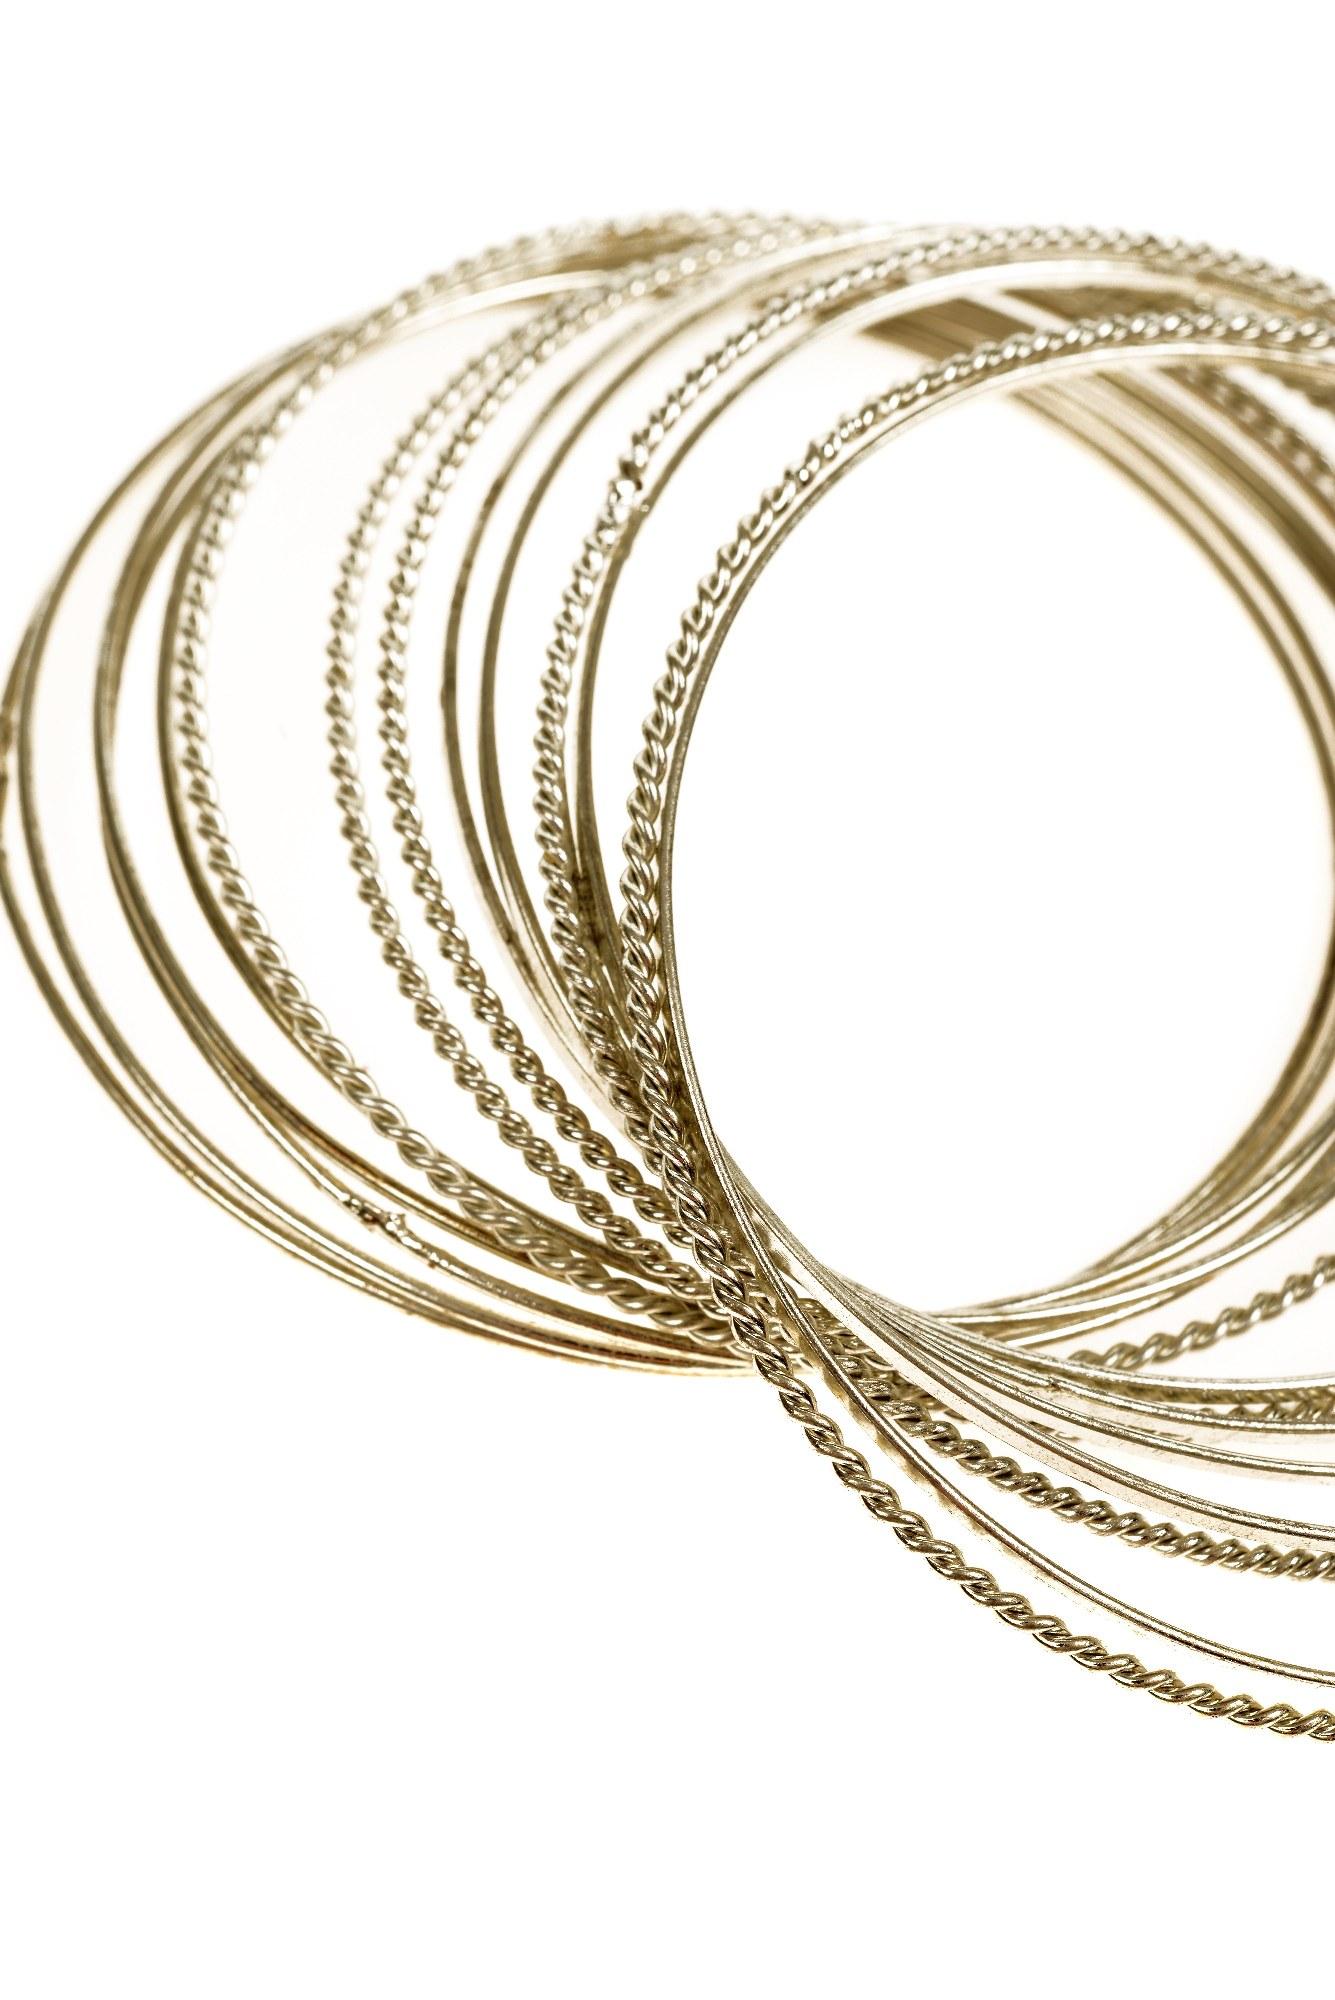 Set bratari metalice argintiu antichizat